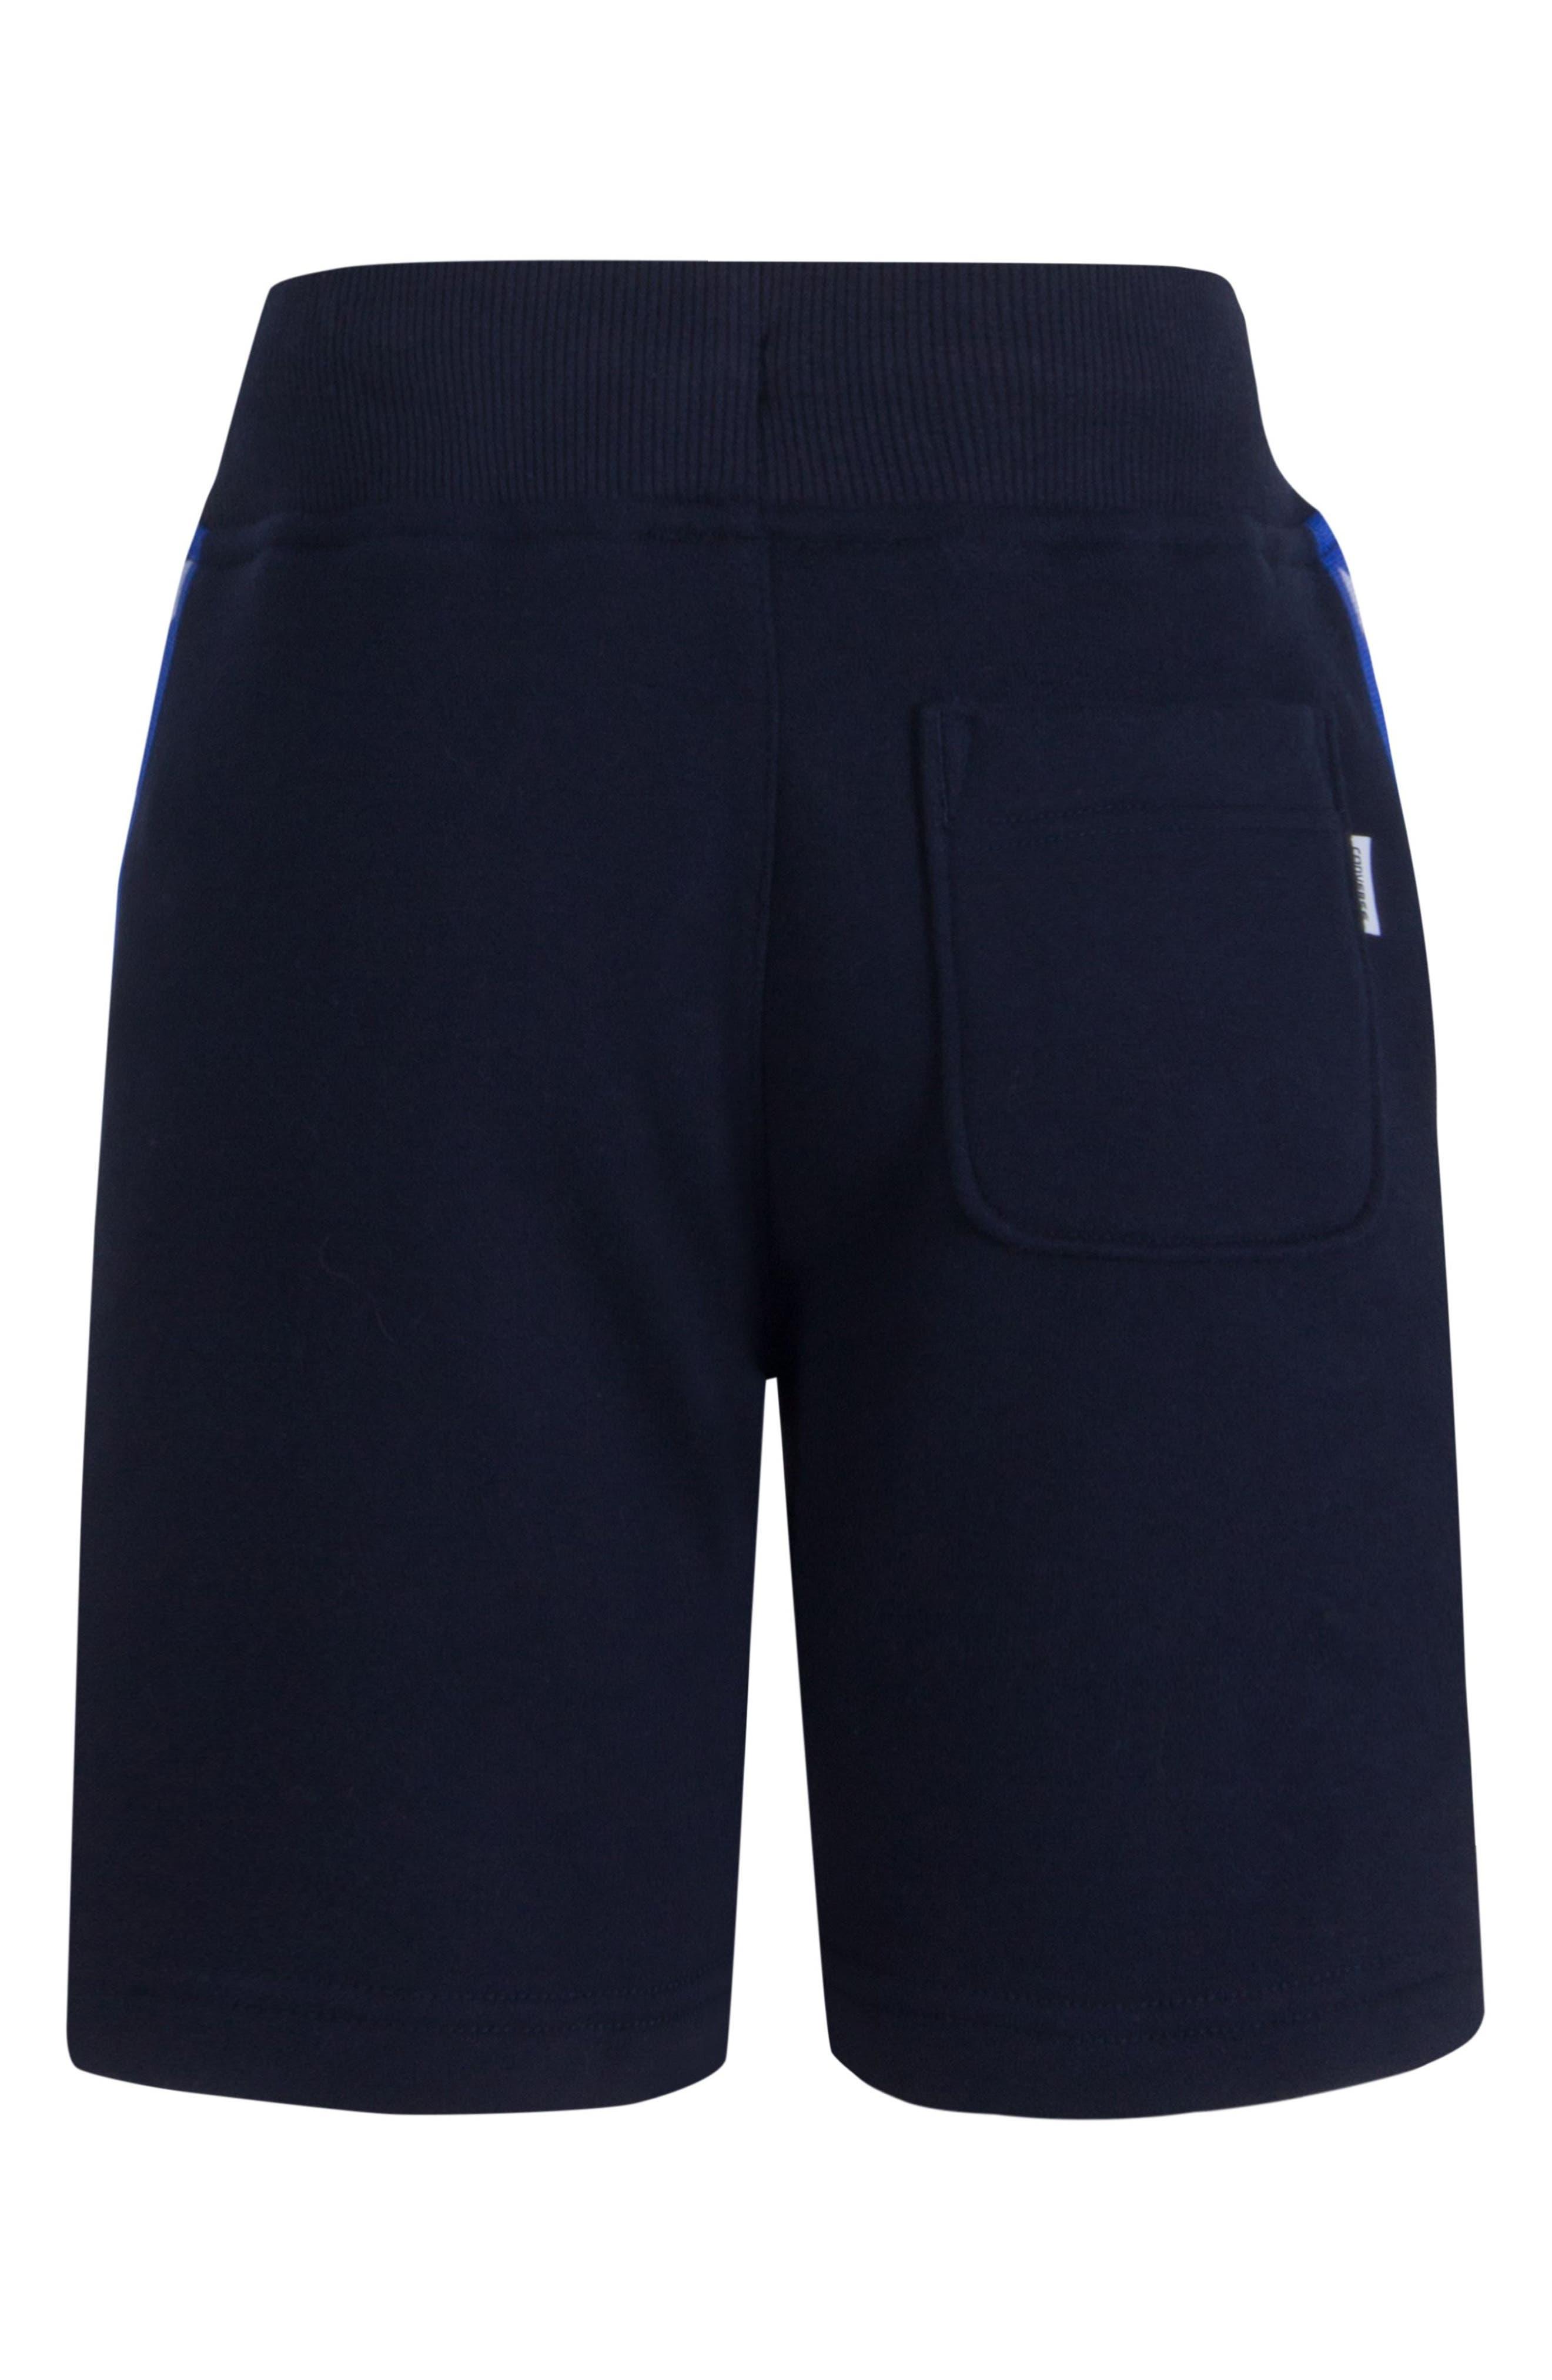 Alternate Image 2  - Converse Star Knit Shorts (Big Boys)